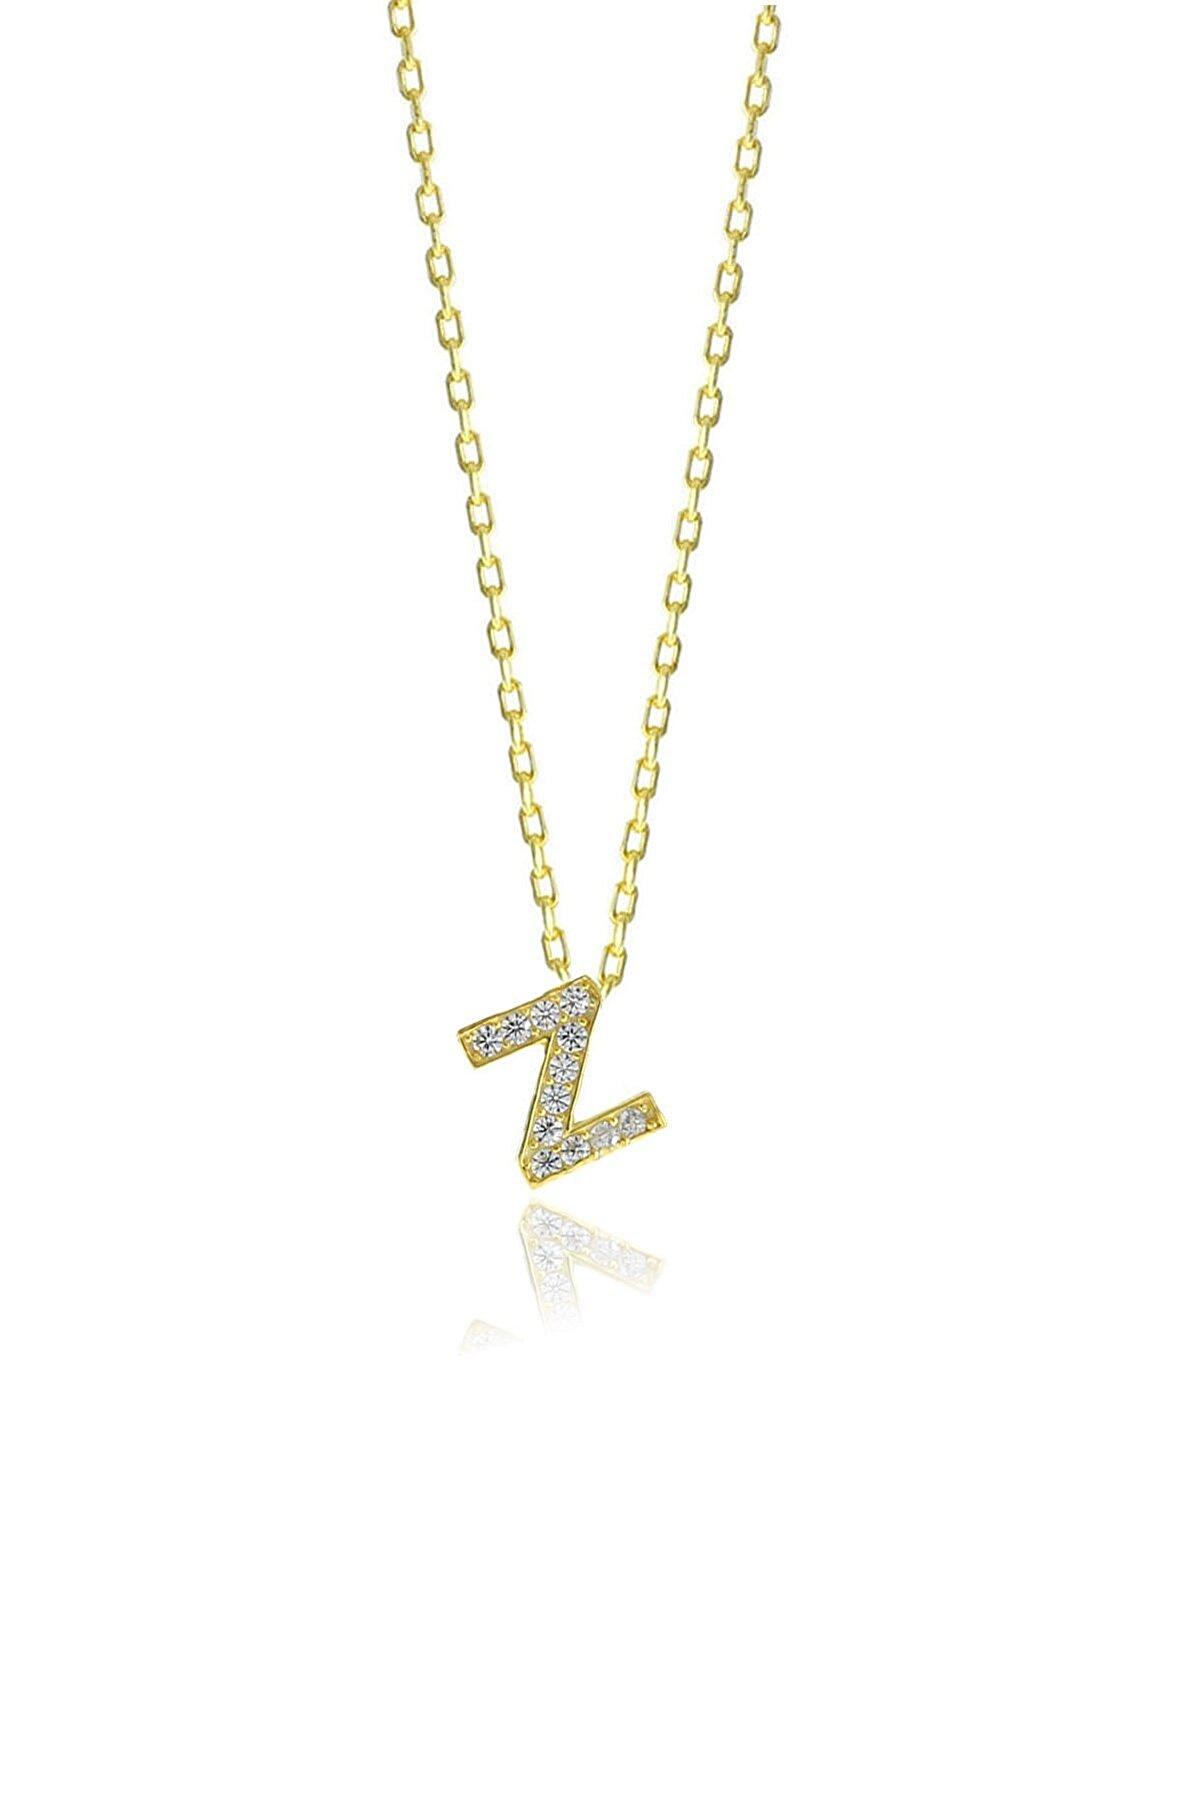 Söğütlü Silver Gümüş  Altın Yaldızlı Üç Boyutlu Minimal Z Gümüş Harf Kolye